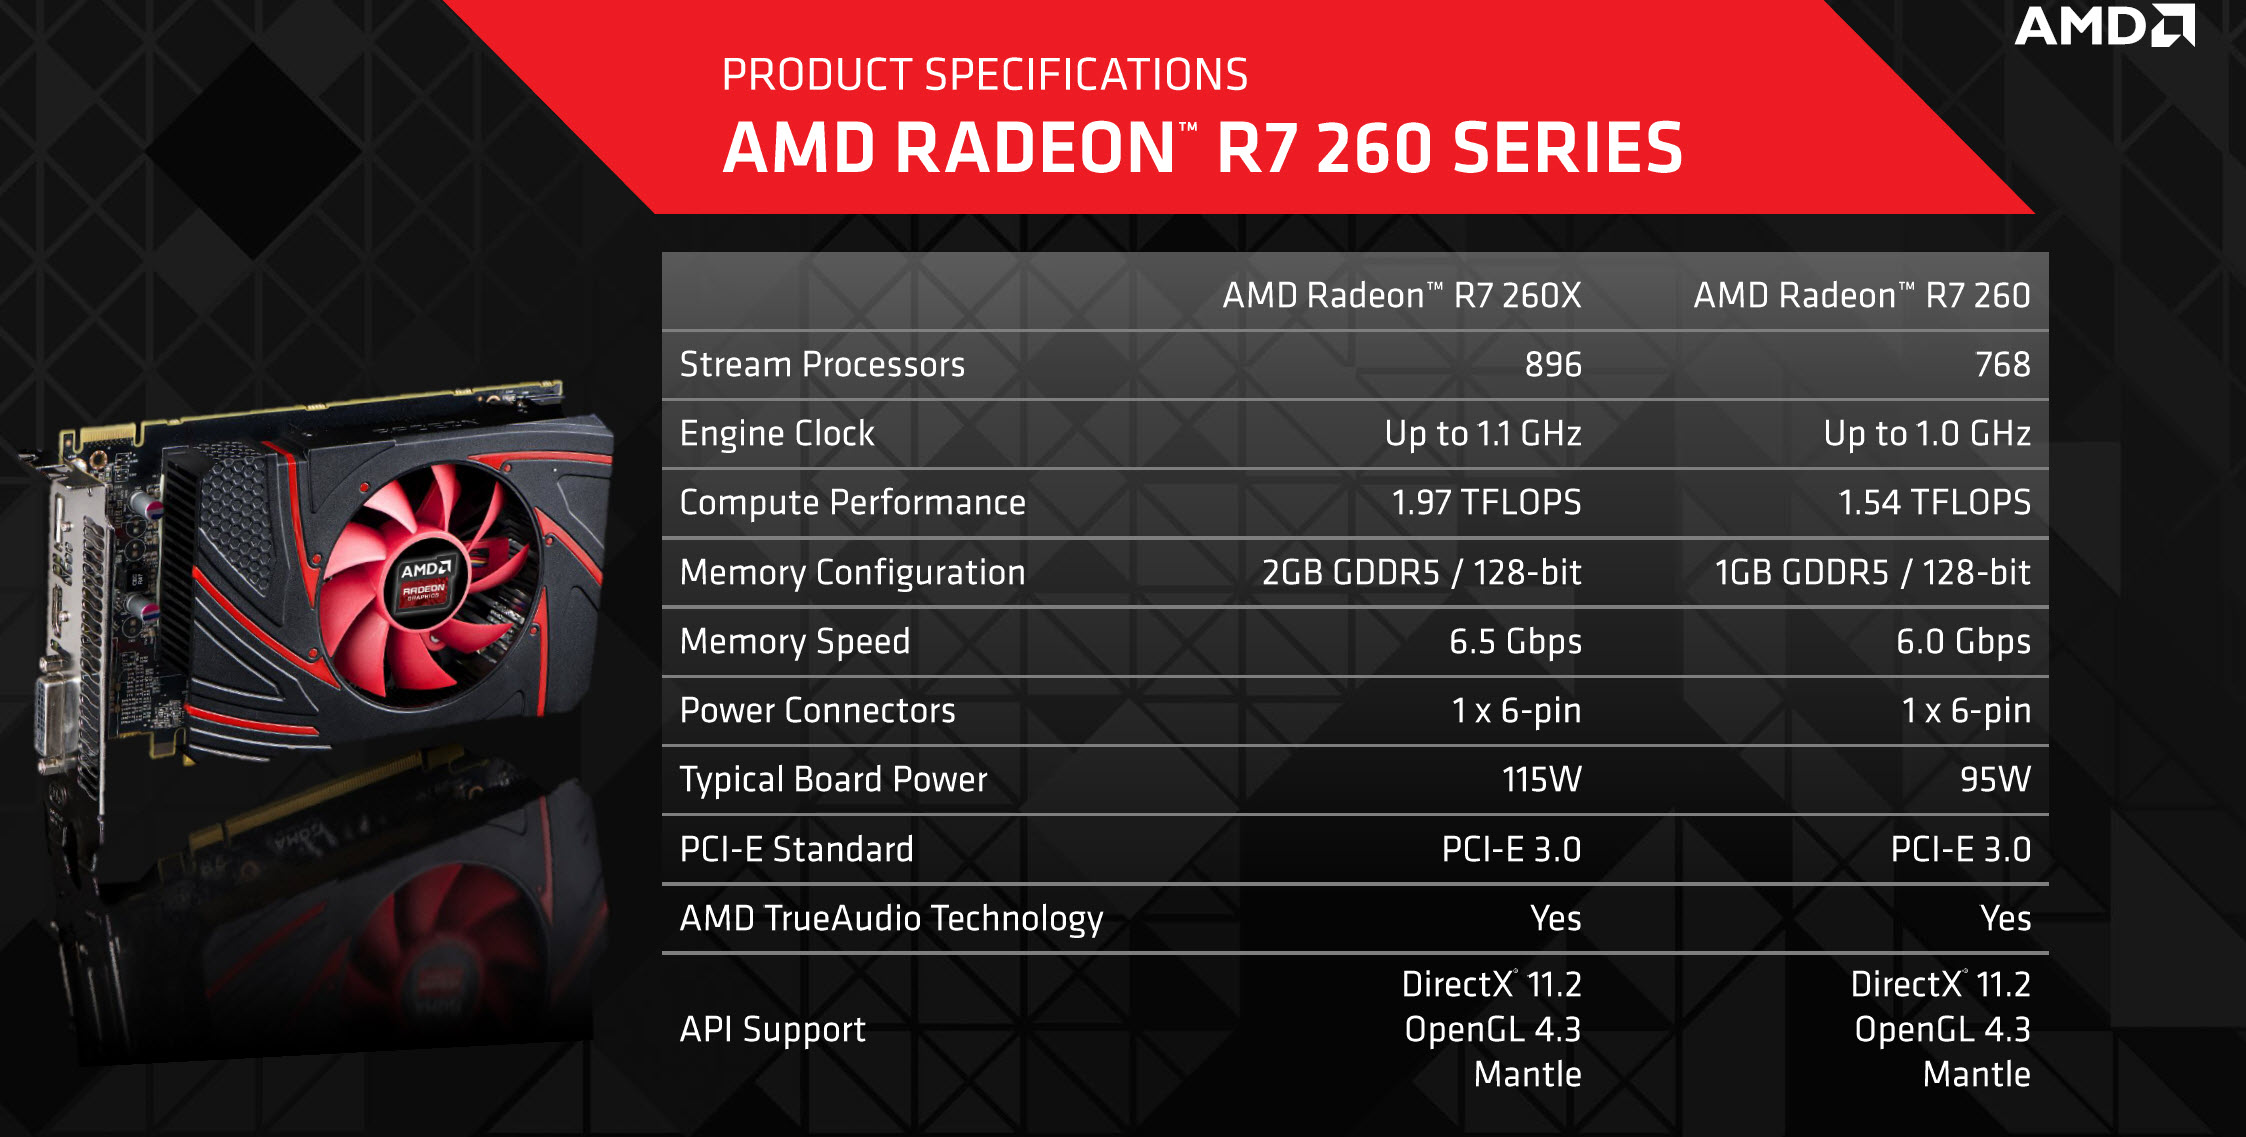 AMD RADEON R7 M260 DRIVERS FOR WINDOWS 7